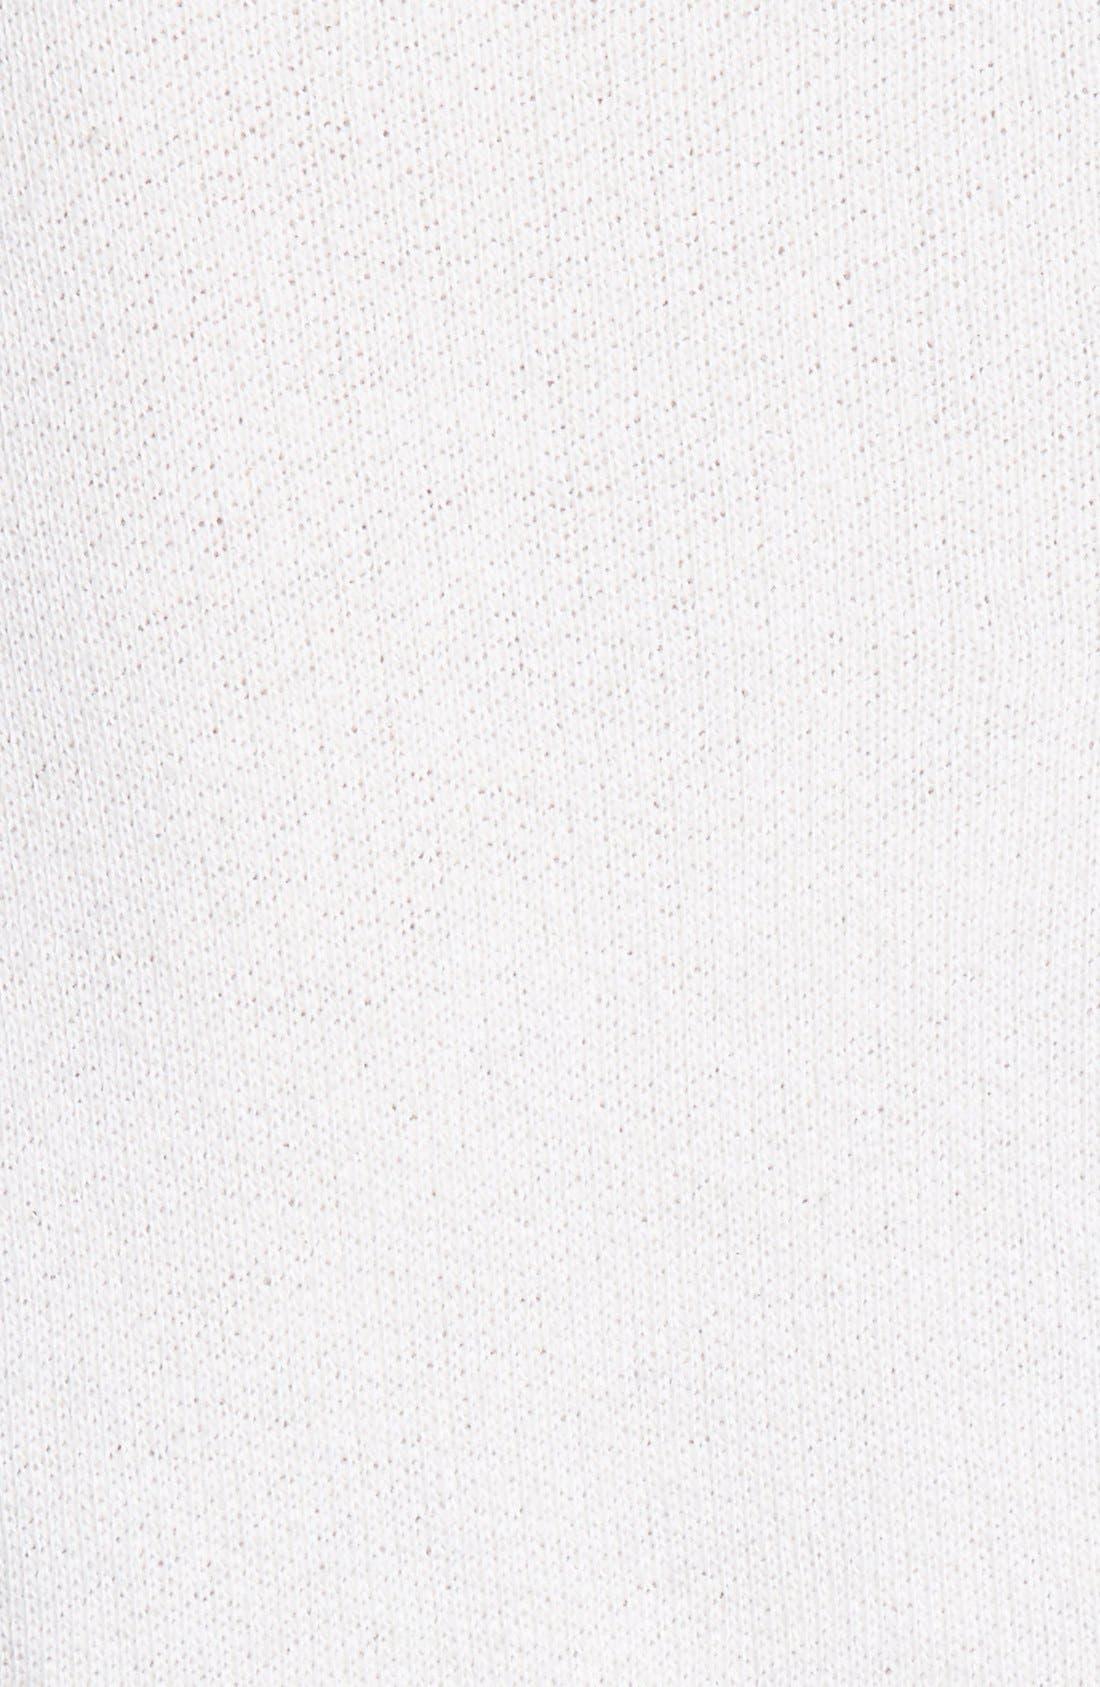 Alternate Image 3  - Alo 'Ravine' Shawl Sweater (Online Only)